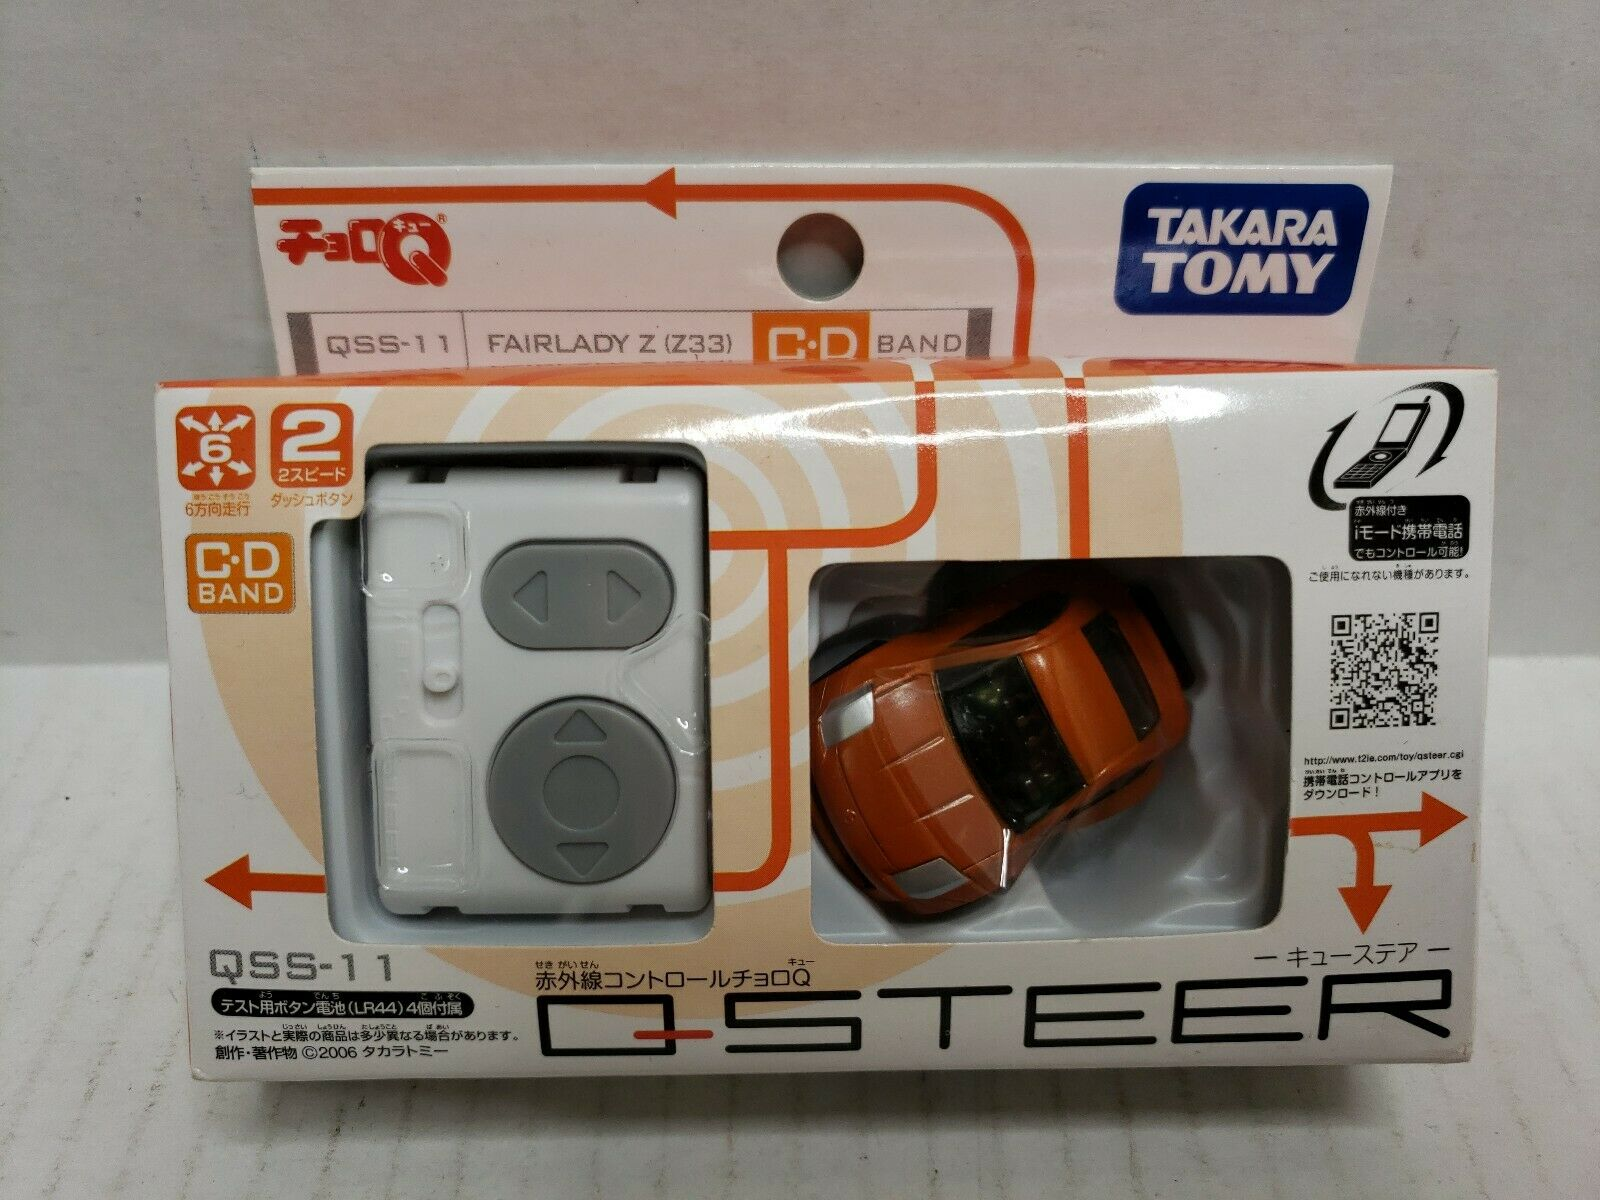 Rare Takara Tomy Chgold Q Q-Steer QSS-11 Nissan Fairlady Z Z33 orange